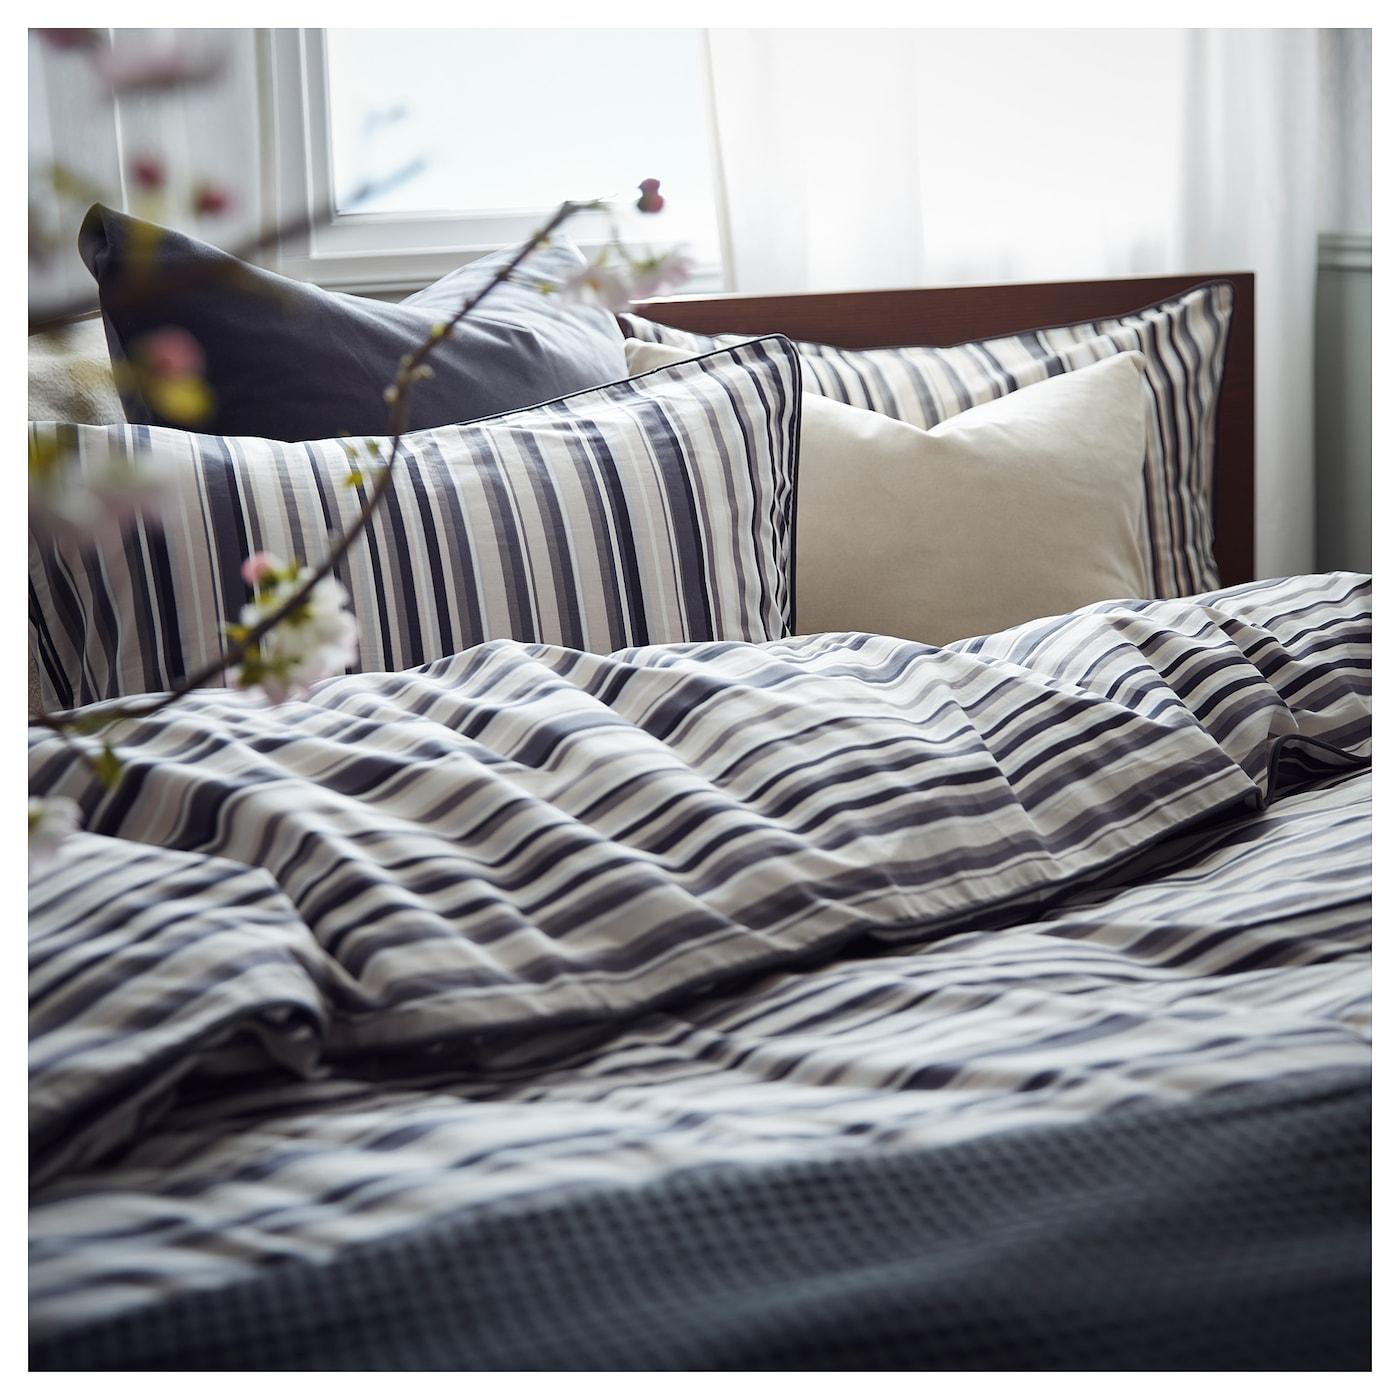 Ikea Rodnarv King size Duvet Cover /& 4 Pillowcases White /& Grey striped